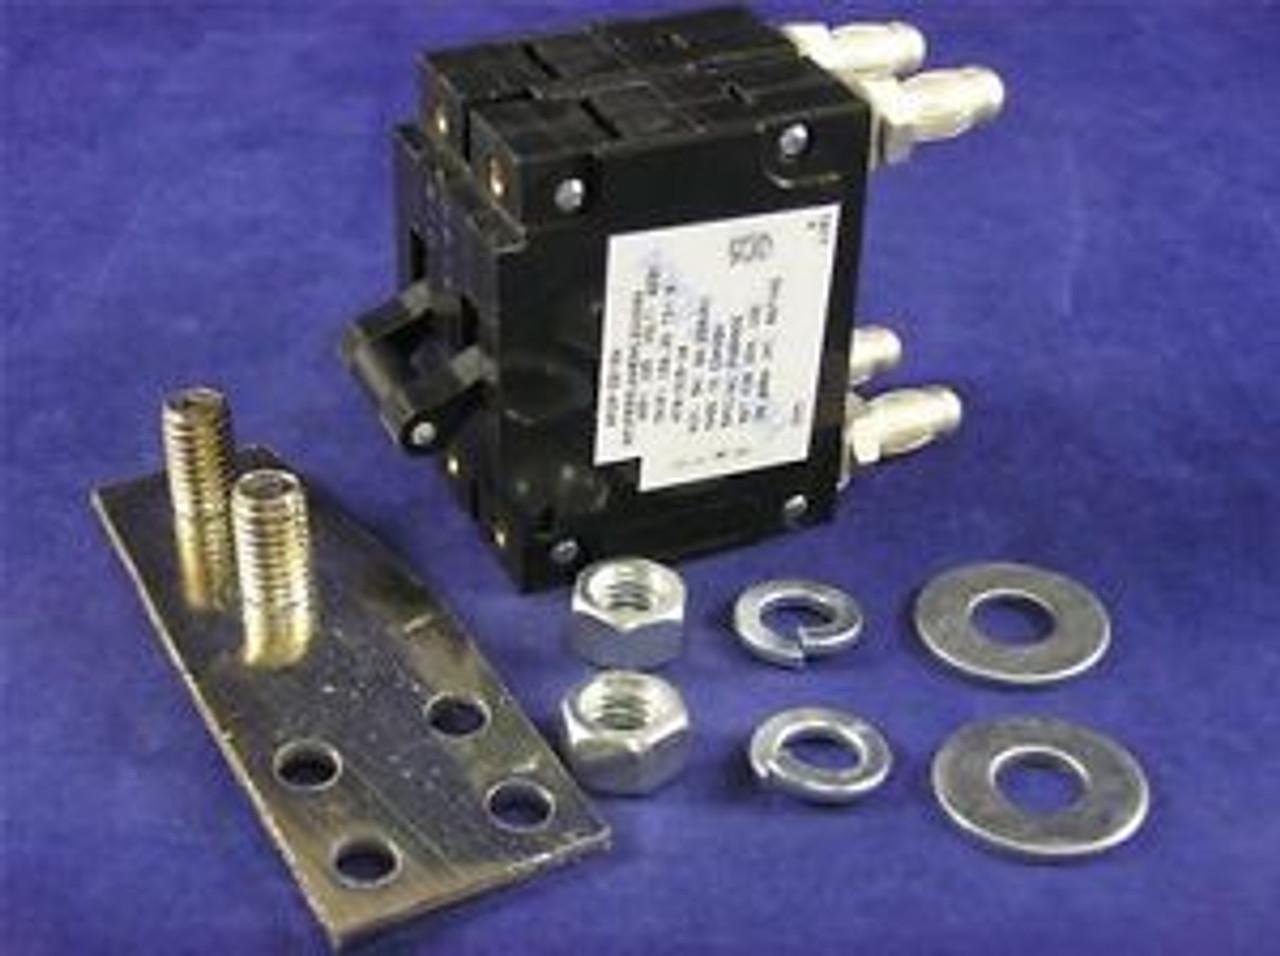 470-318-10 Breaker 125 Amp Bullet Style New Heinemann AM1P-Z2-2W